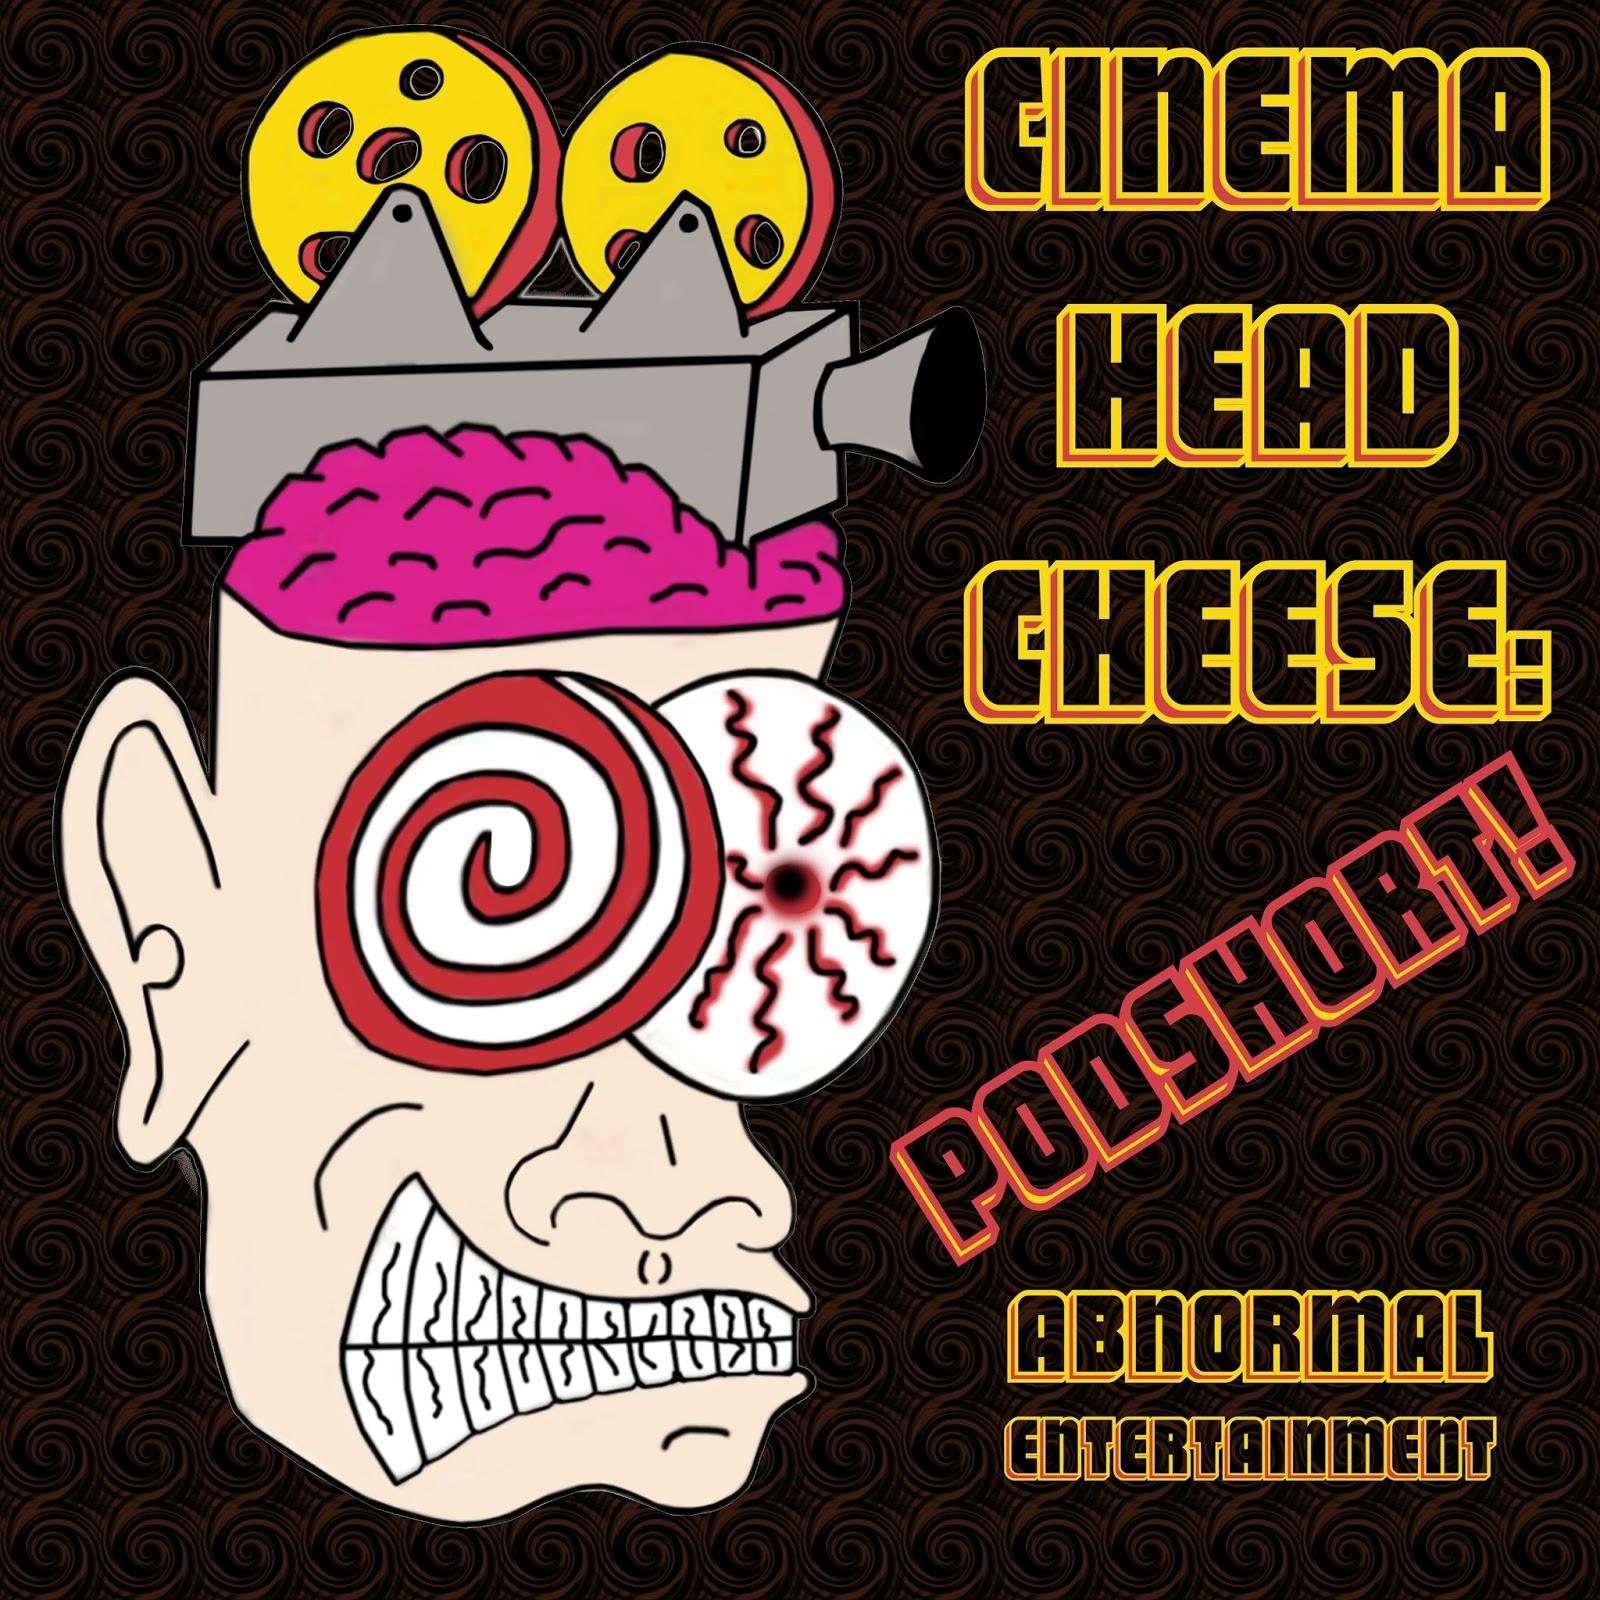 Cinema Head Cheese: Podshort!.